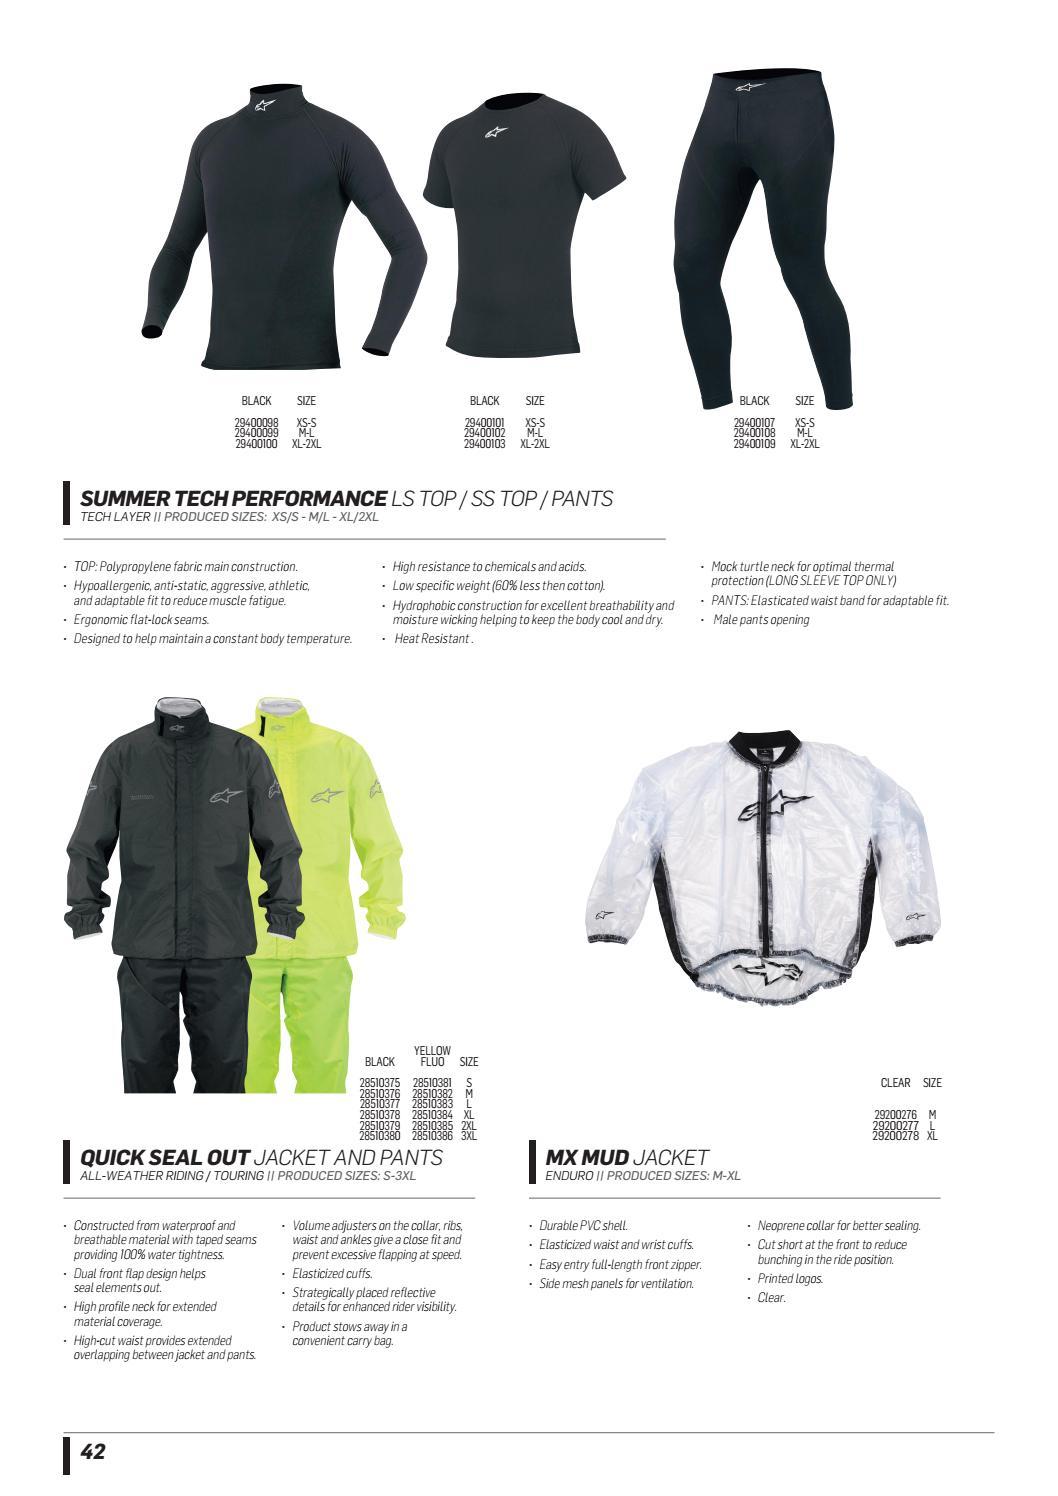 Alpinestars Quick Seal Out Jacket and Pants EU